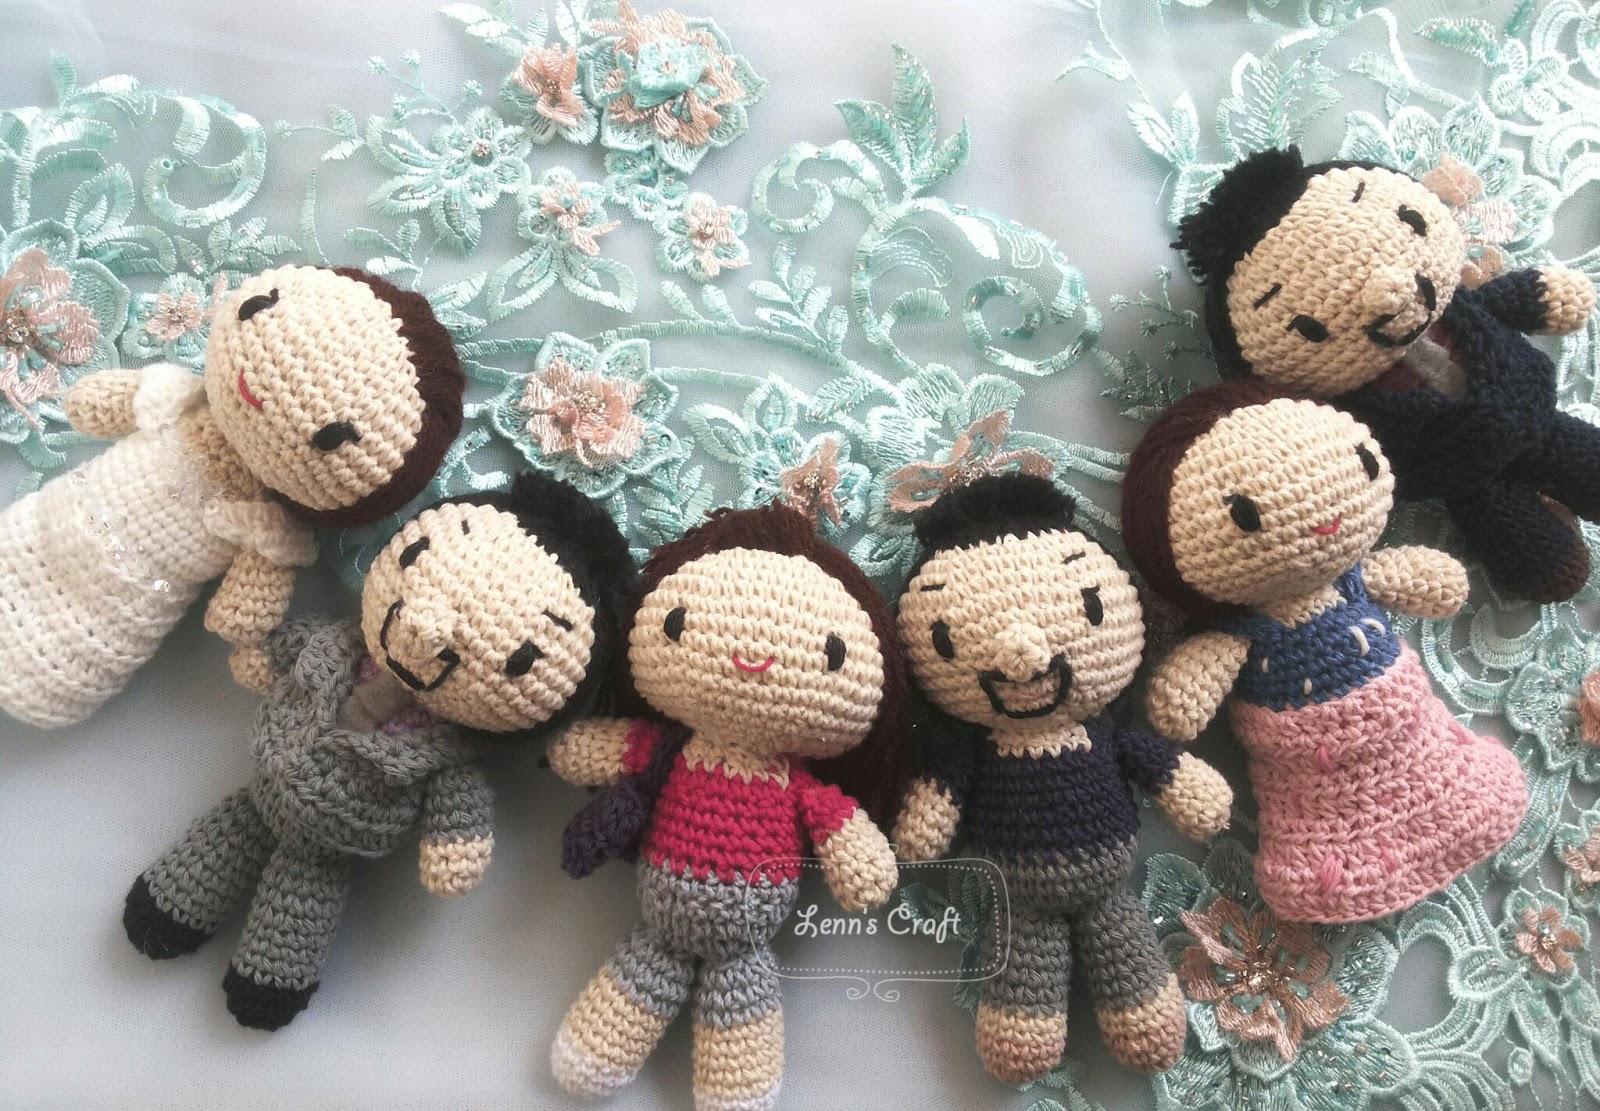 Amigurumi Boneka : Lenn s craft handmade doll amigurumi boneka rajut